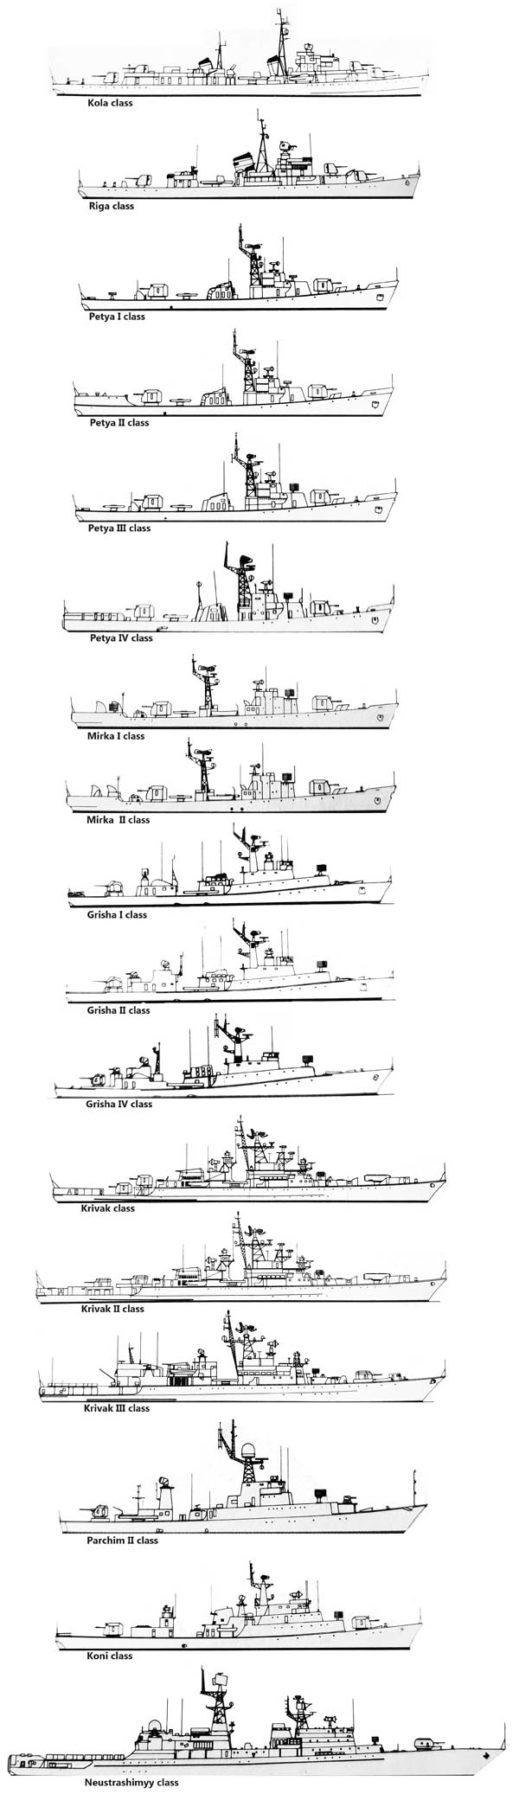 overview of soviet frigates from the Kola to the Neustrashimyy class